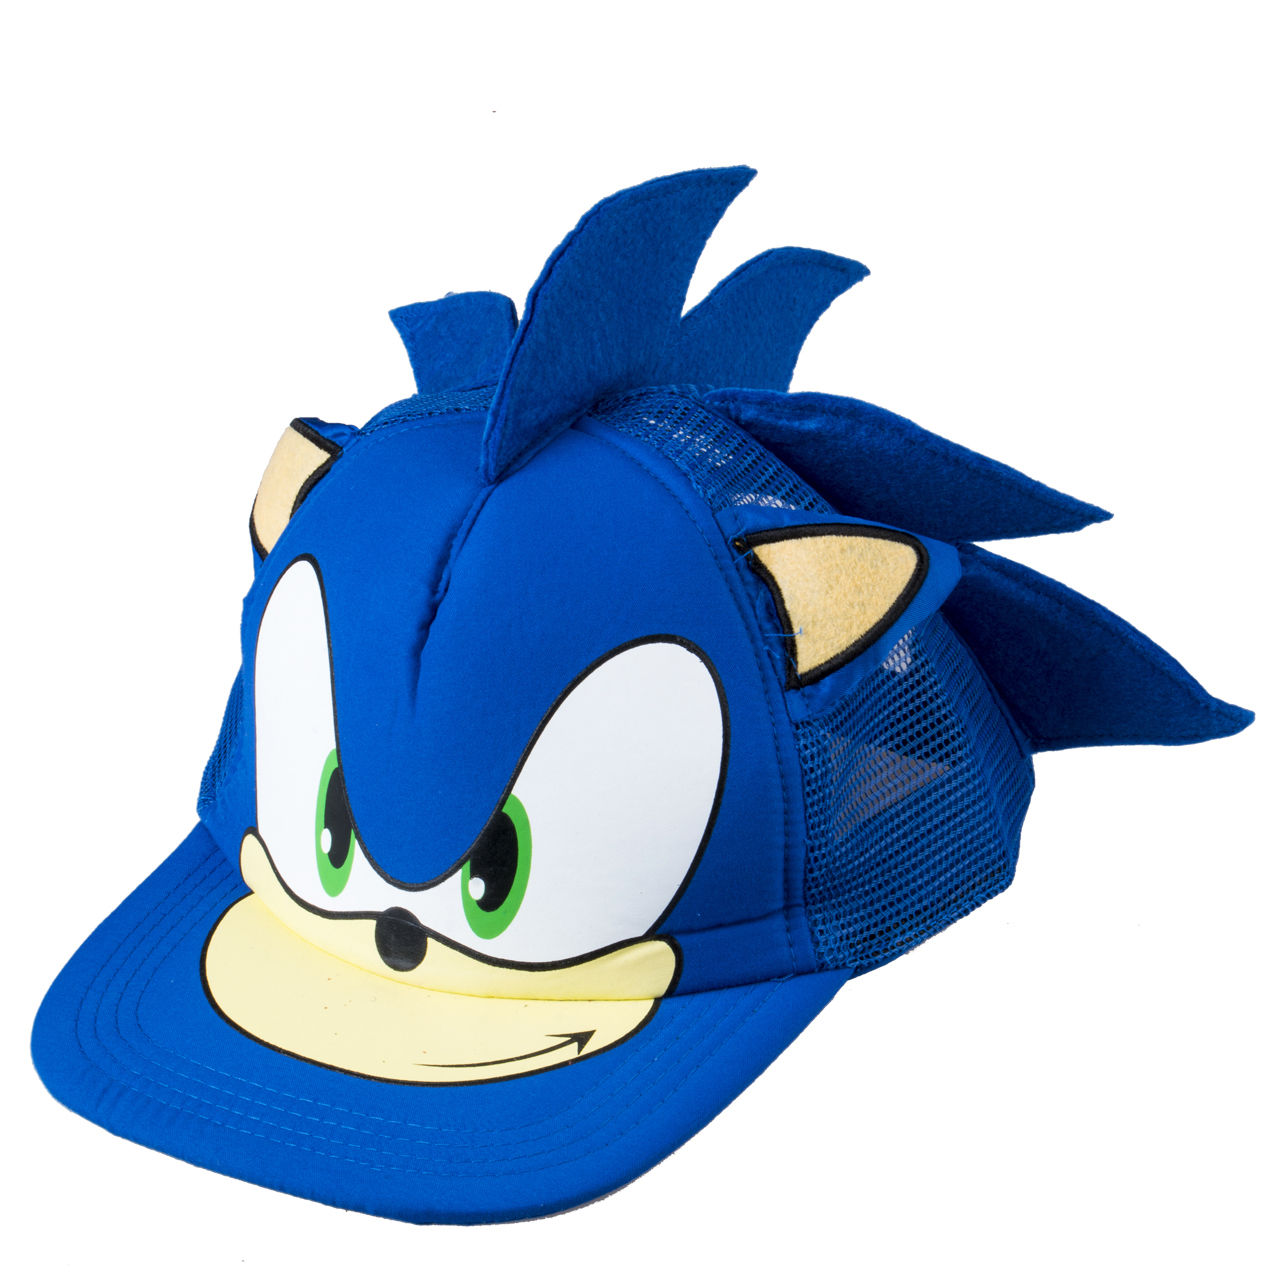 Cute Kids Cartoon Sonic The Hedgehog Baseball Hats Cap Boy Girl Youth Adjustable Blue Hip Hop Cap